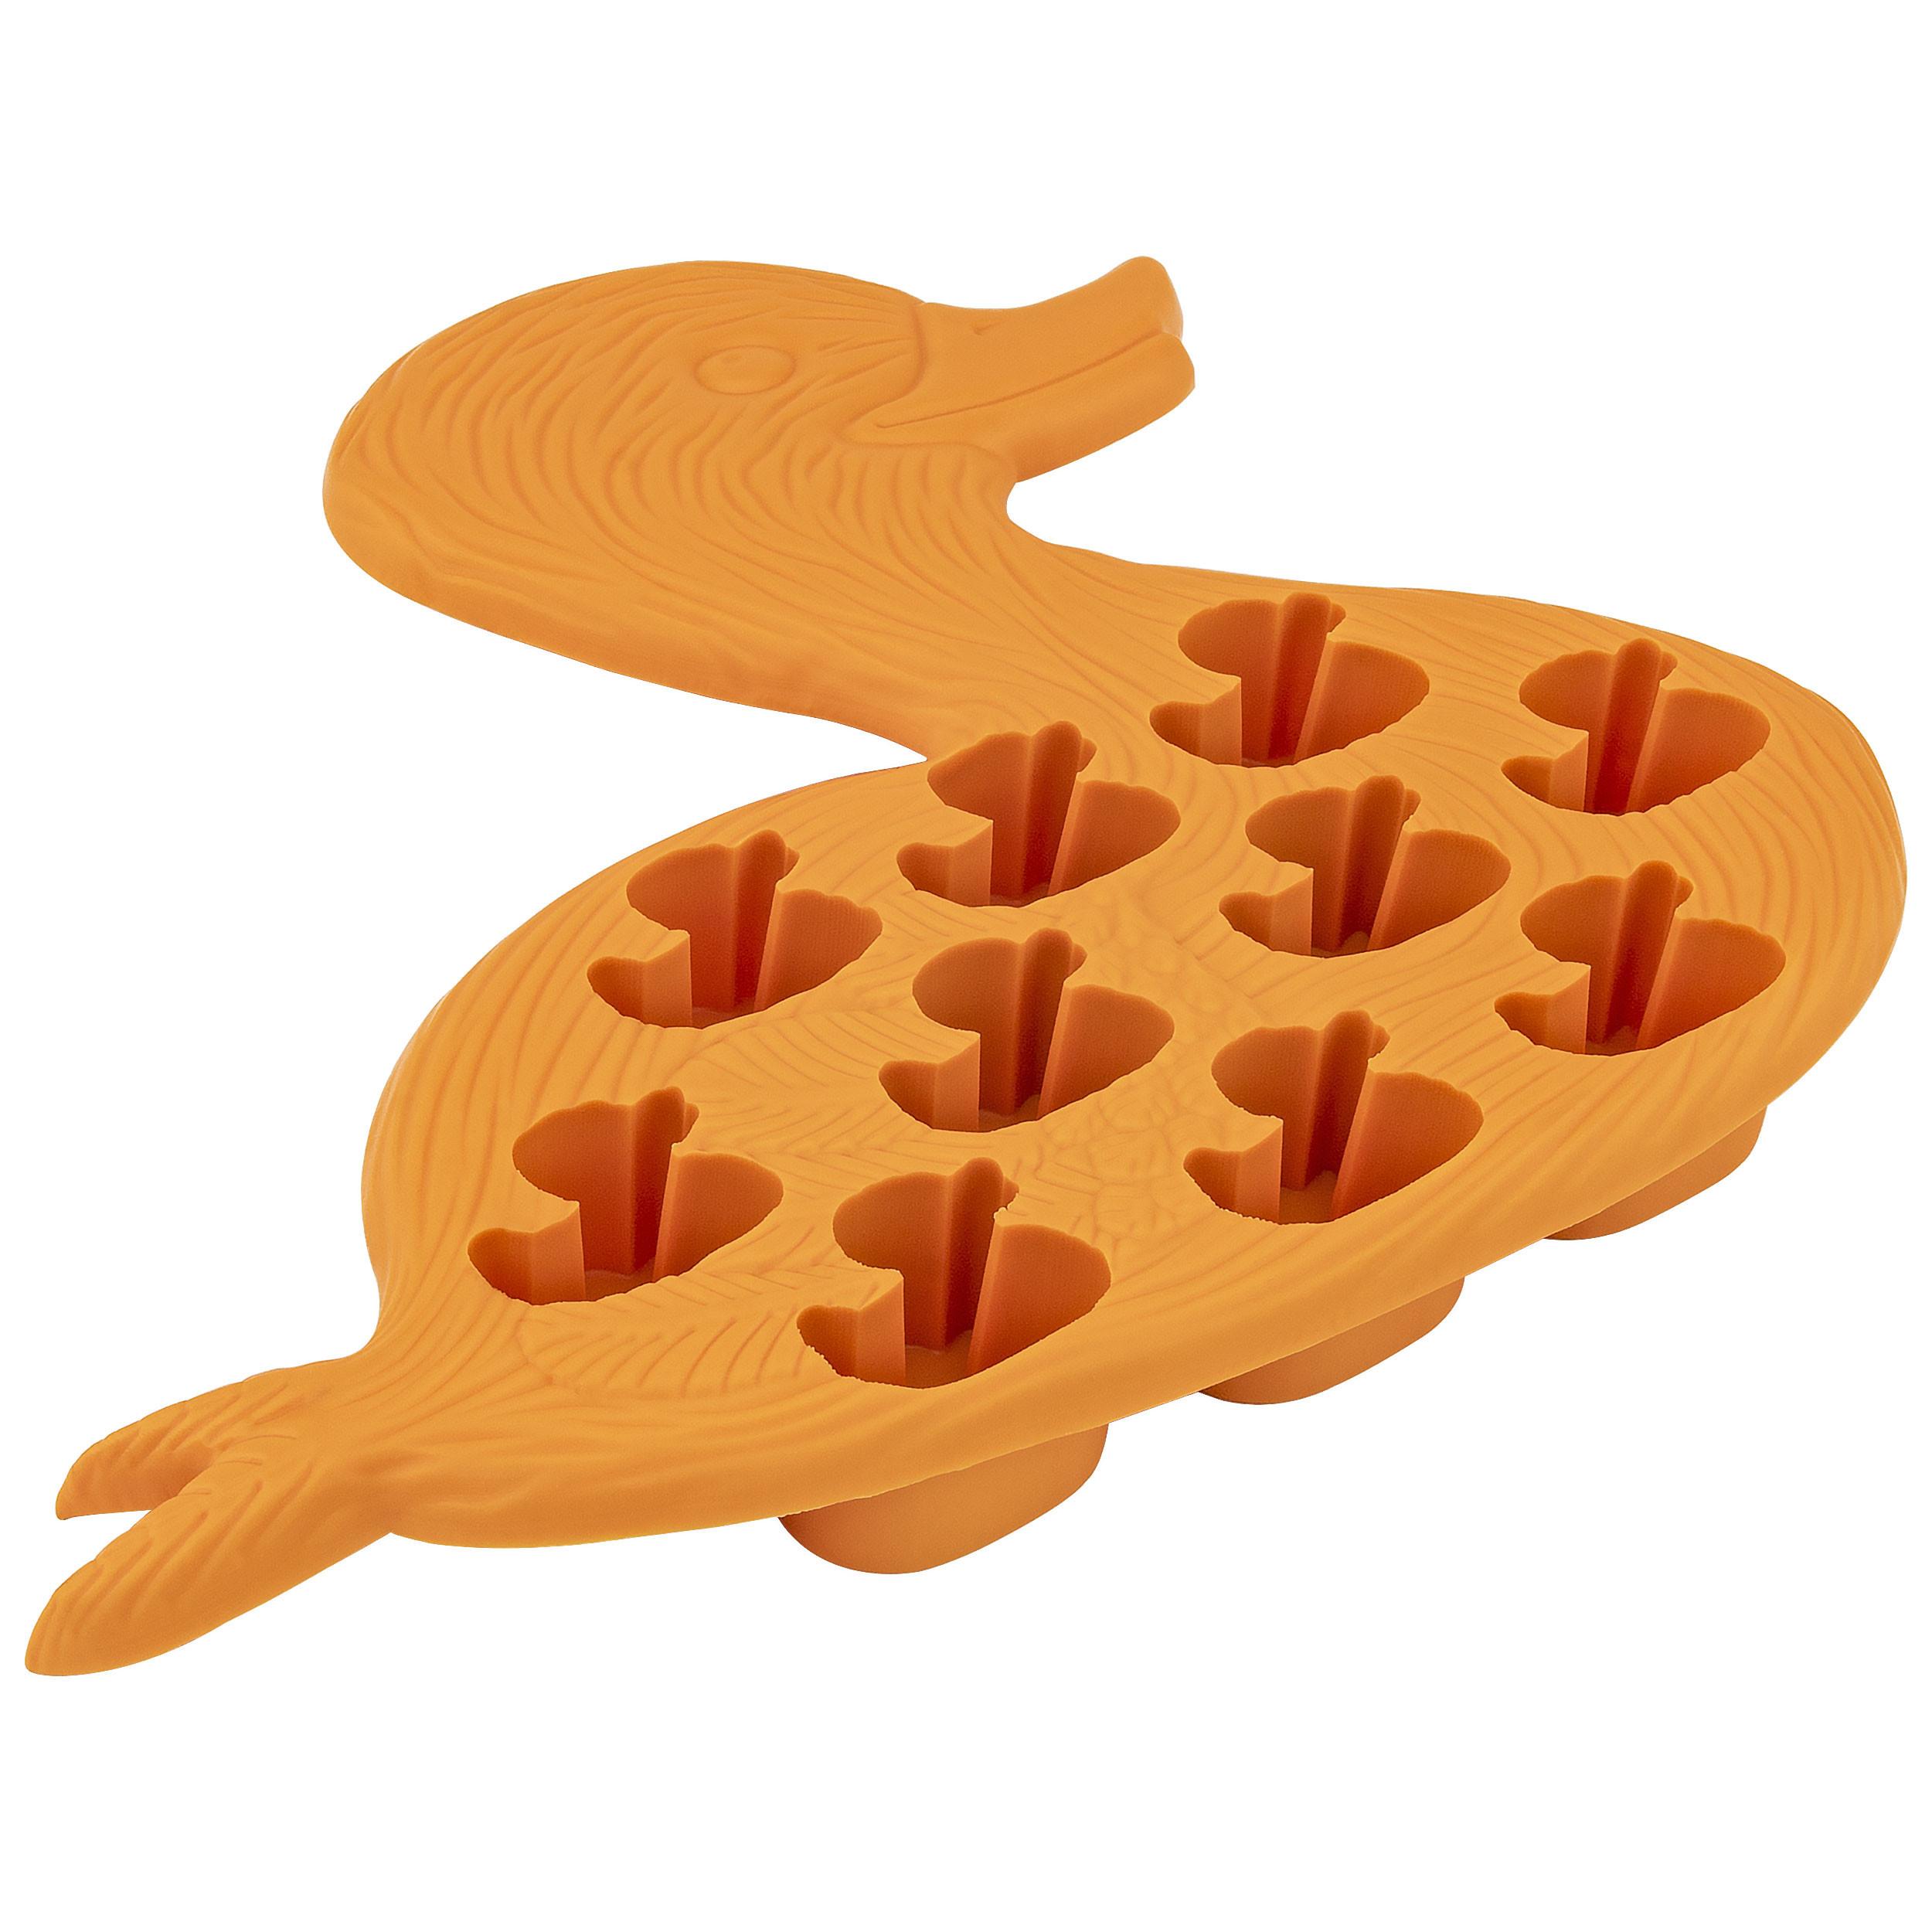 Fairly Odd Novelties FON-10011 Duck Ice Cube Tray, One Size, Orange